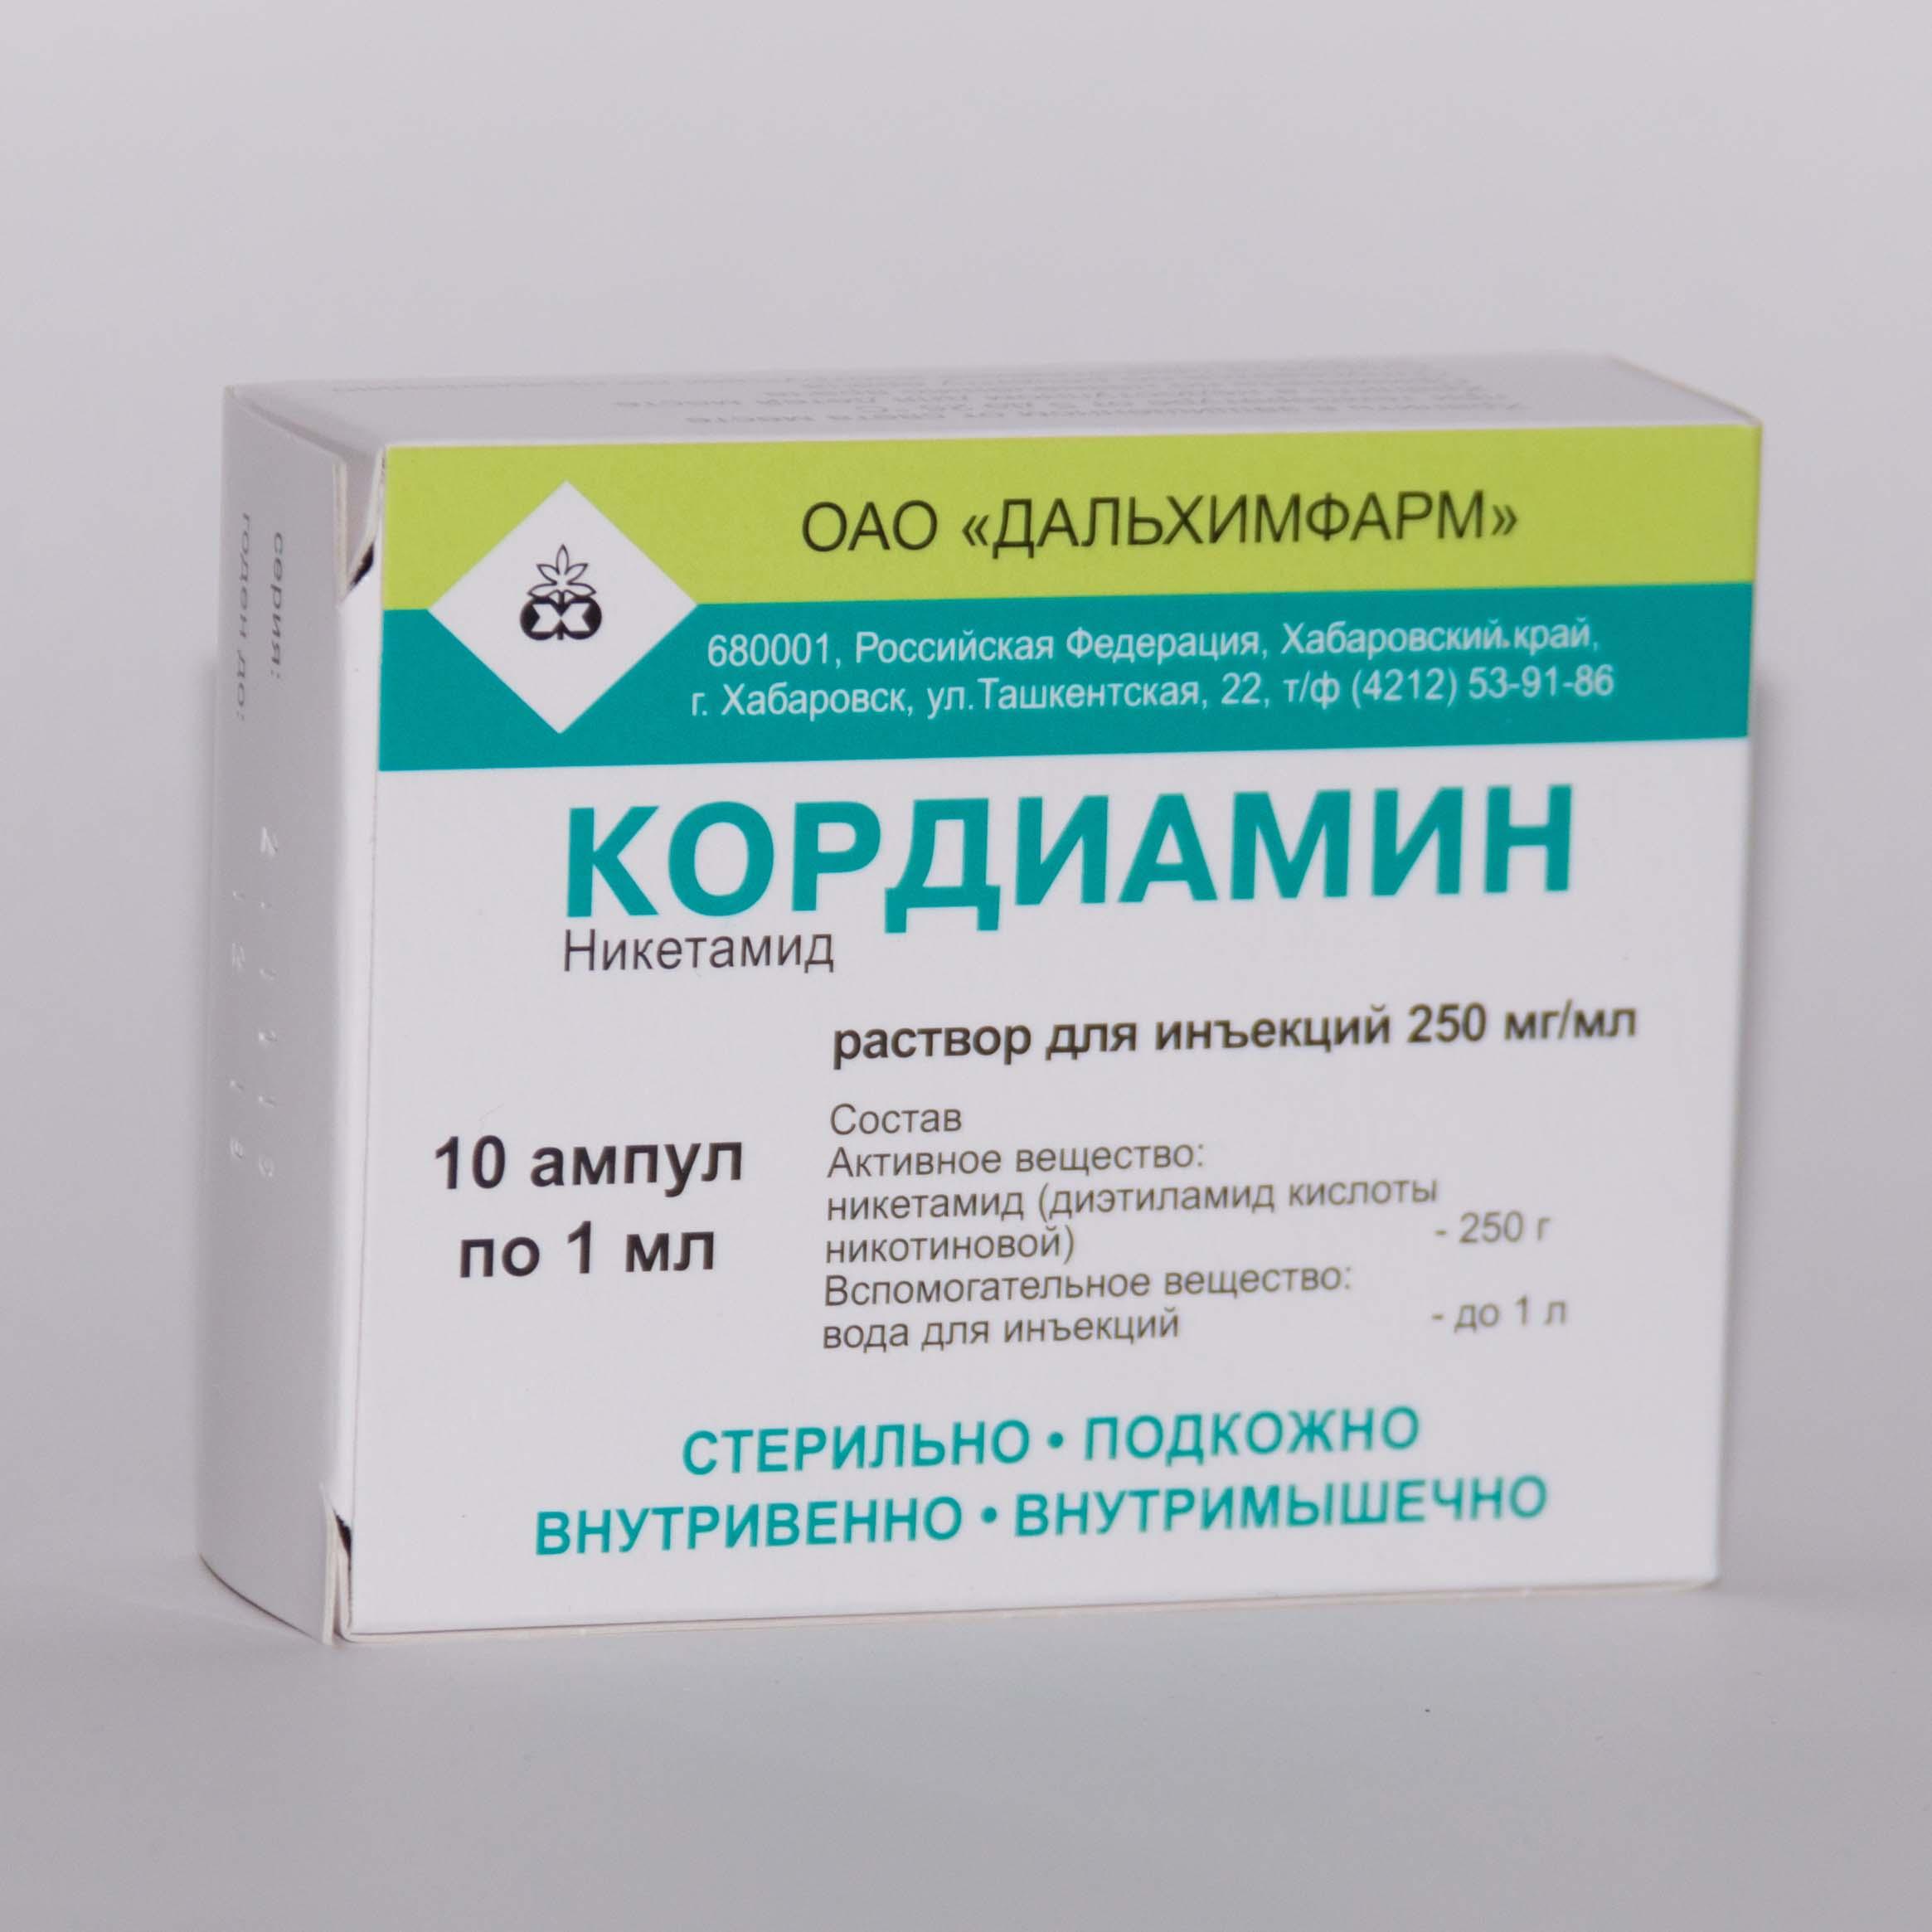 Cordiamin (nikethamide) 250 mg/ml. ampoules 2 ml. №10